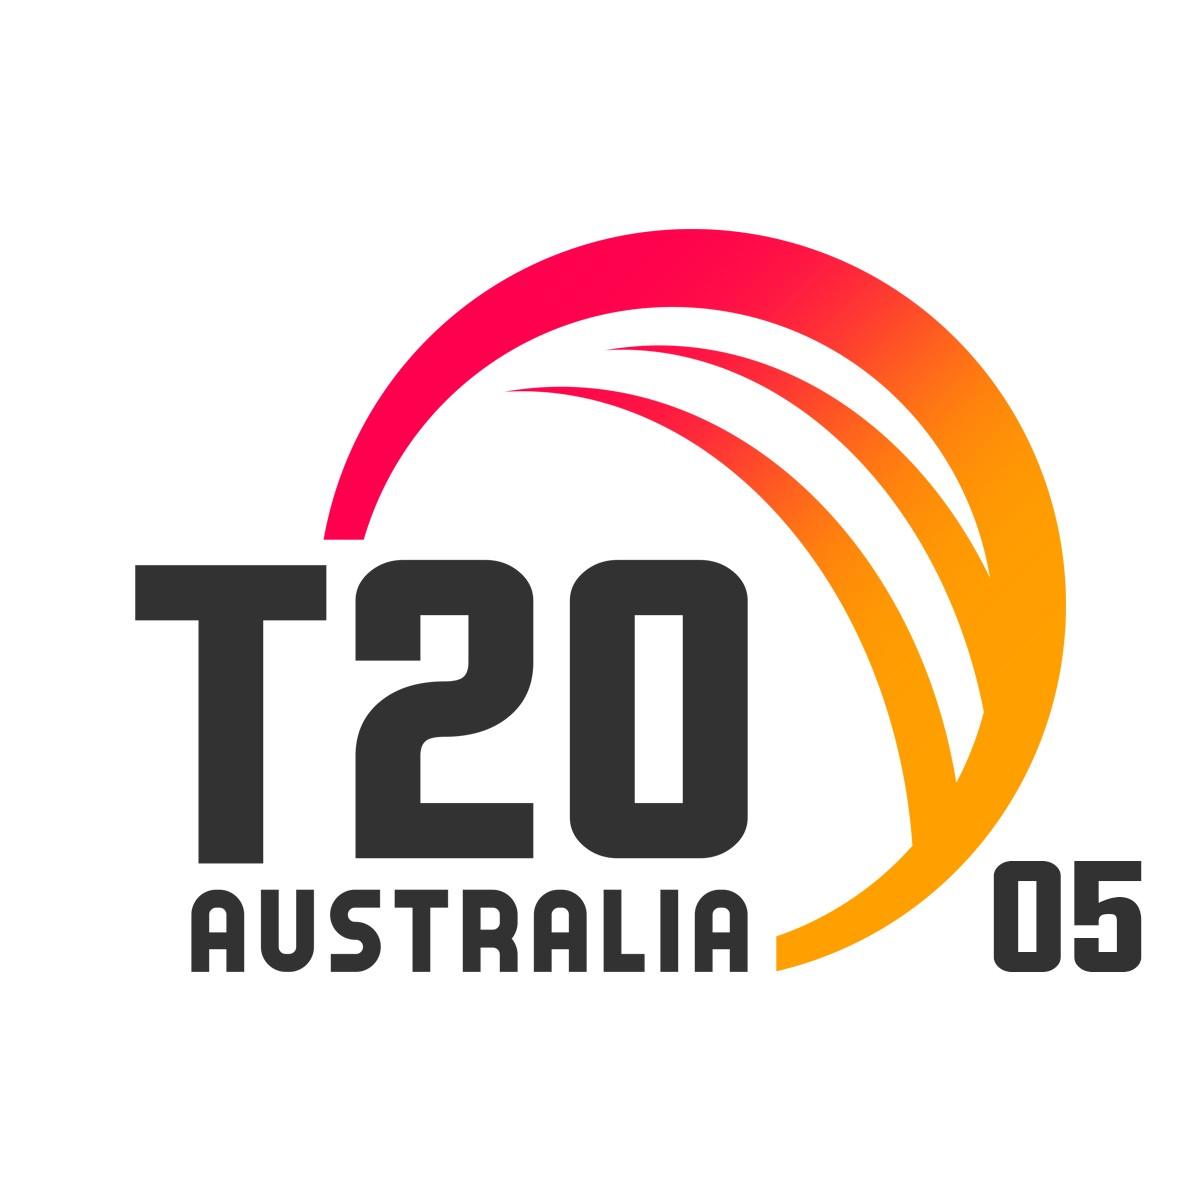 t20a 05 logo.jpg